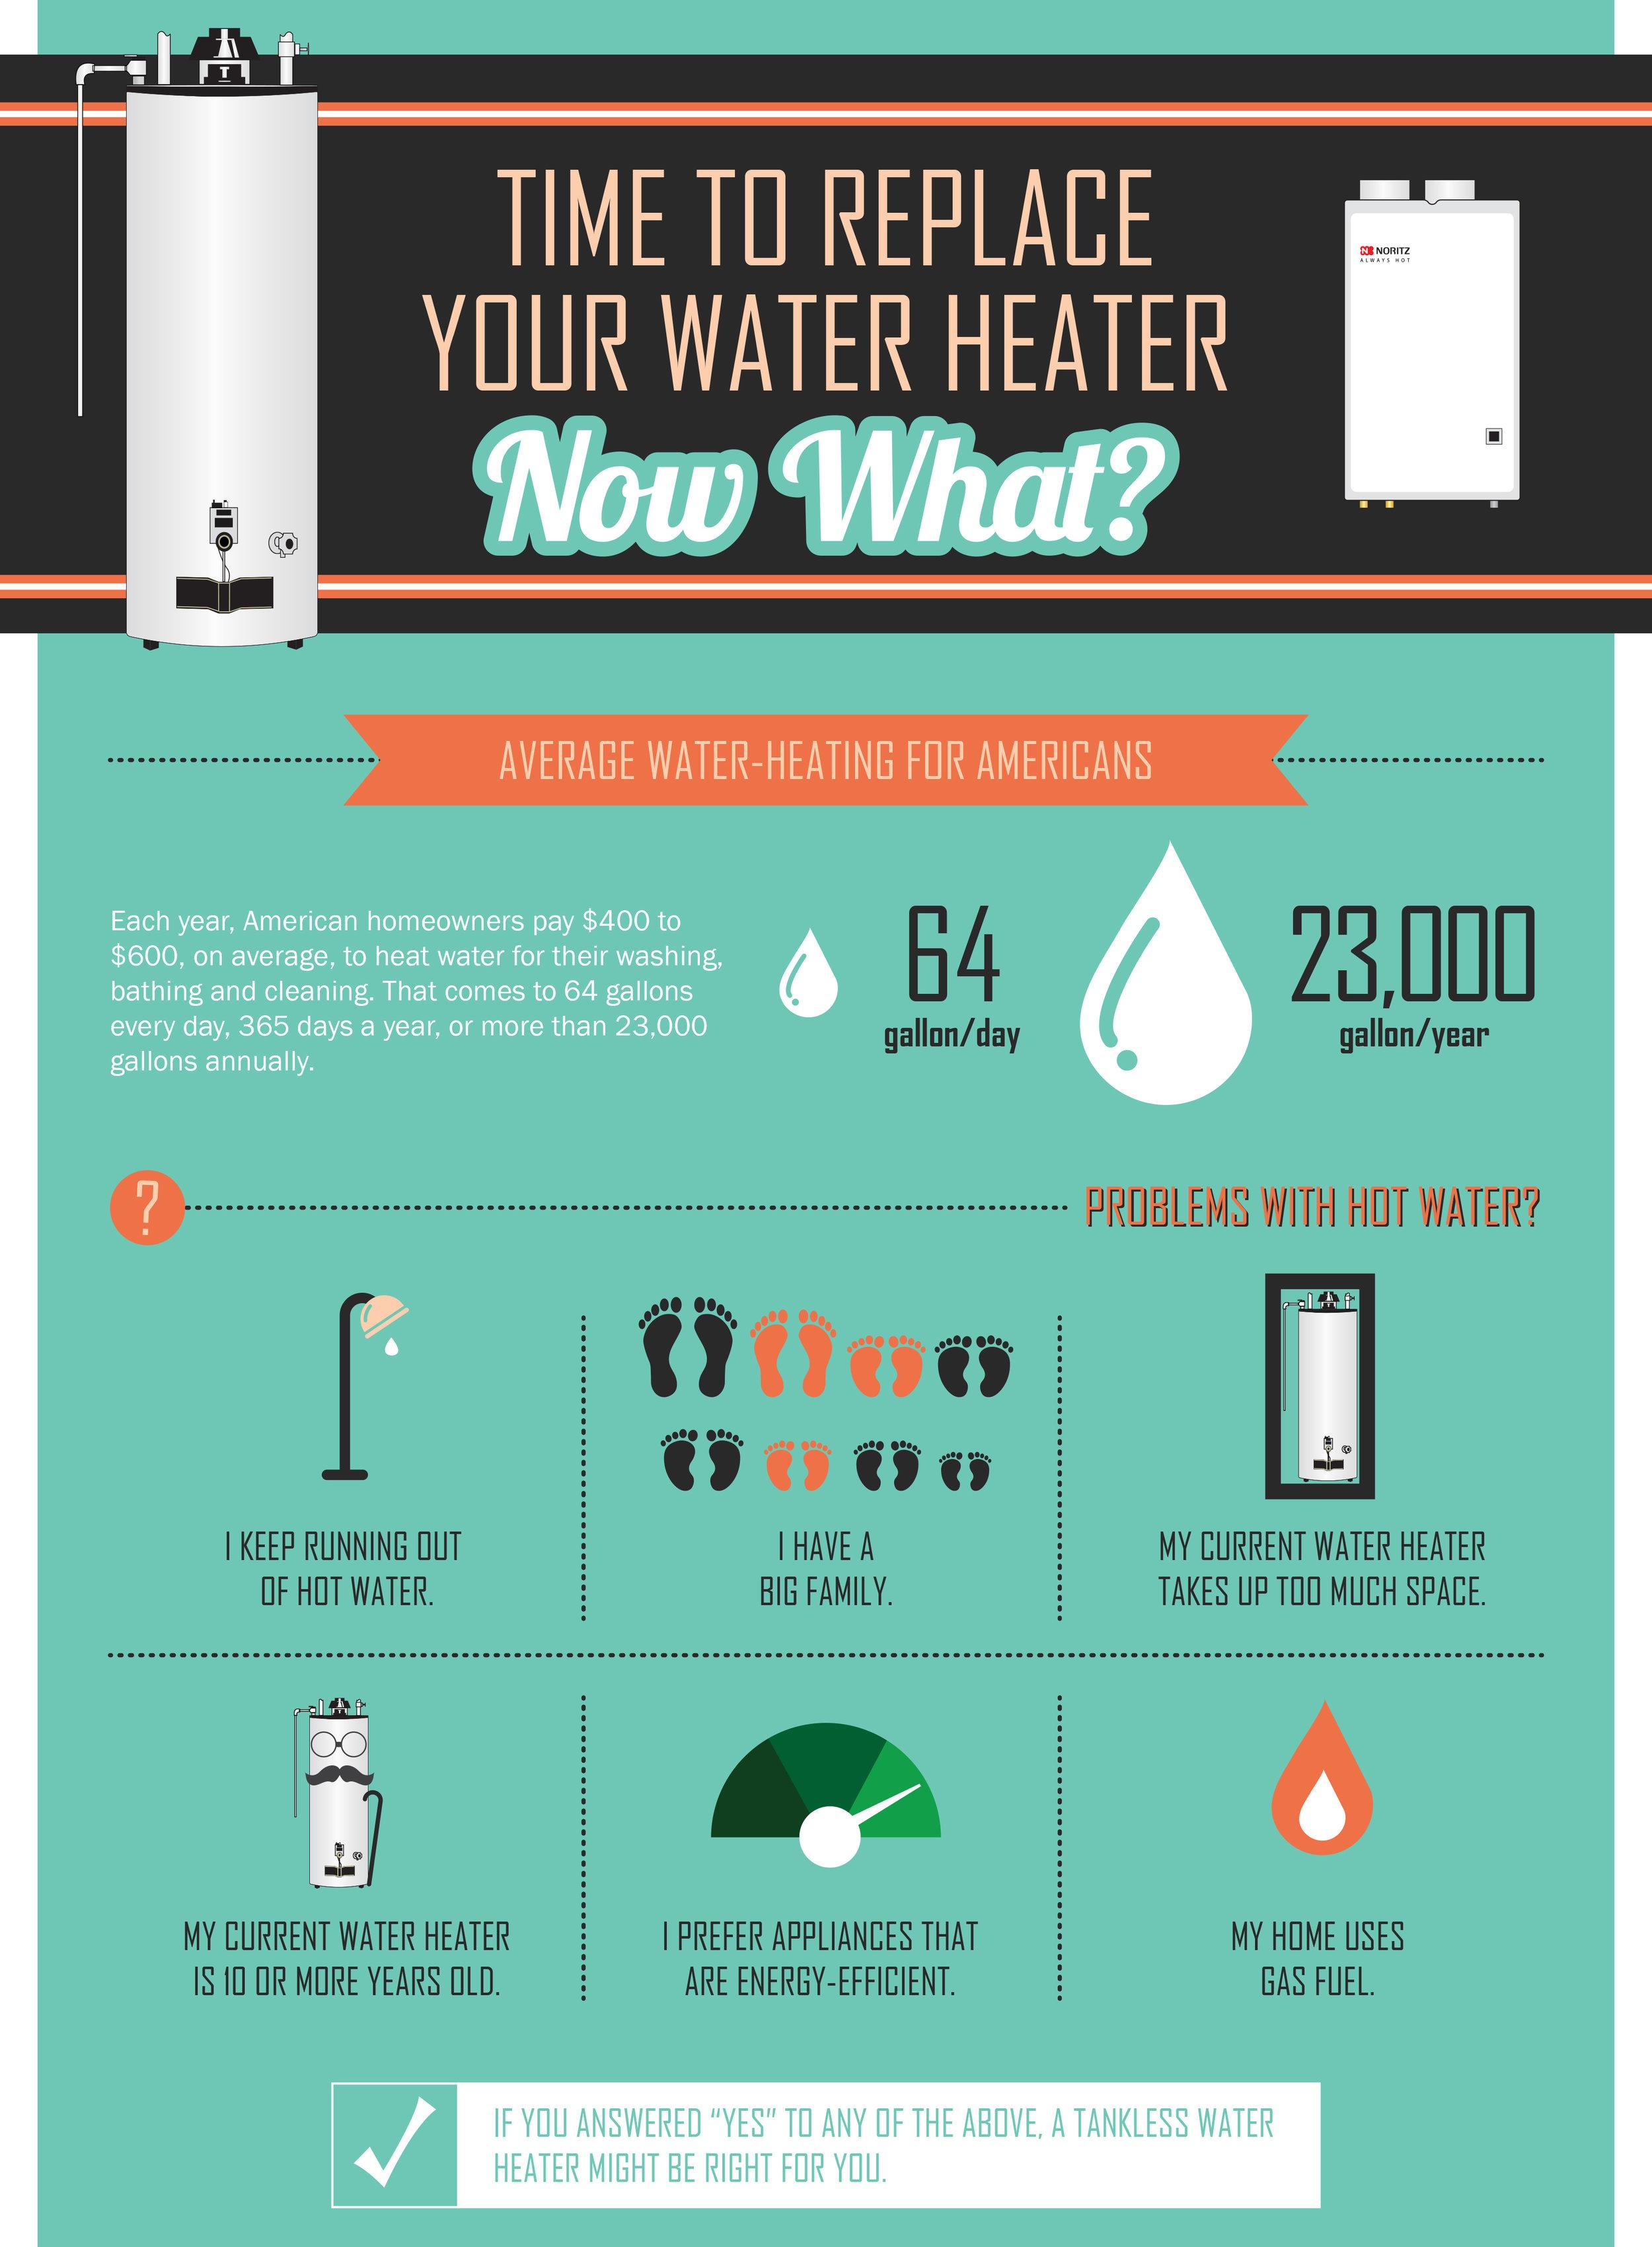 average-water-heating-for-americans-infographic-2013-noritz.jpg